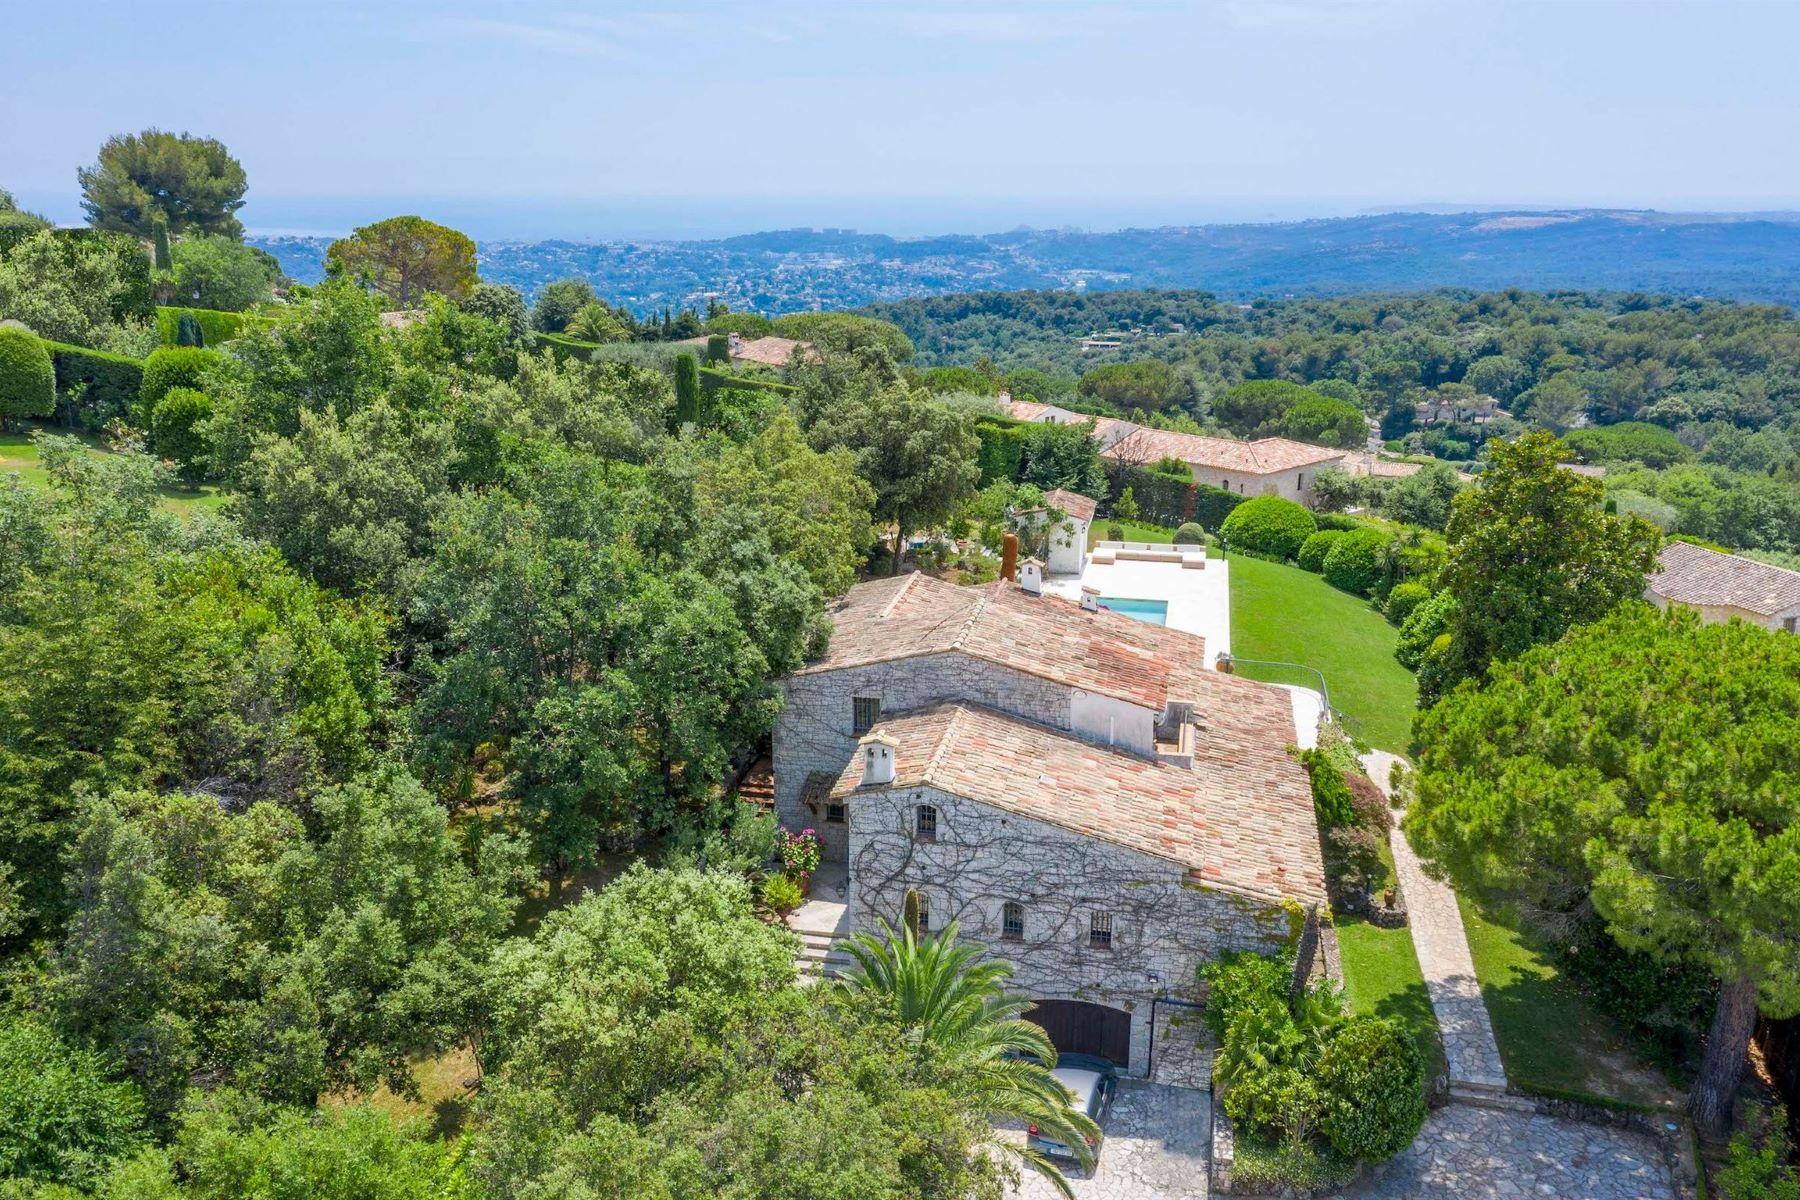 Single Family Homes por un Venta en Charming provencial style property in a private domain- sea views Other Provence-Alpes-Cote D'Azur, Provincia - Alpes - Costa Azul 06570 Francia